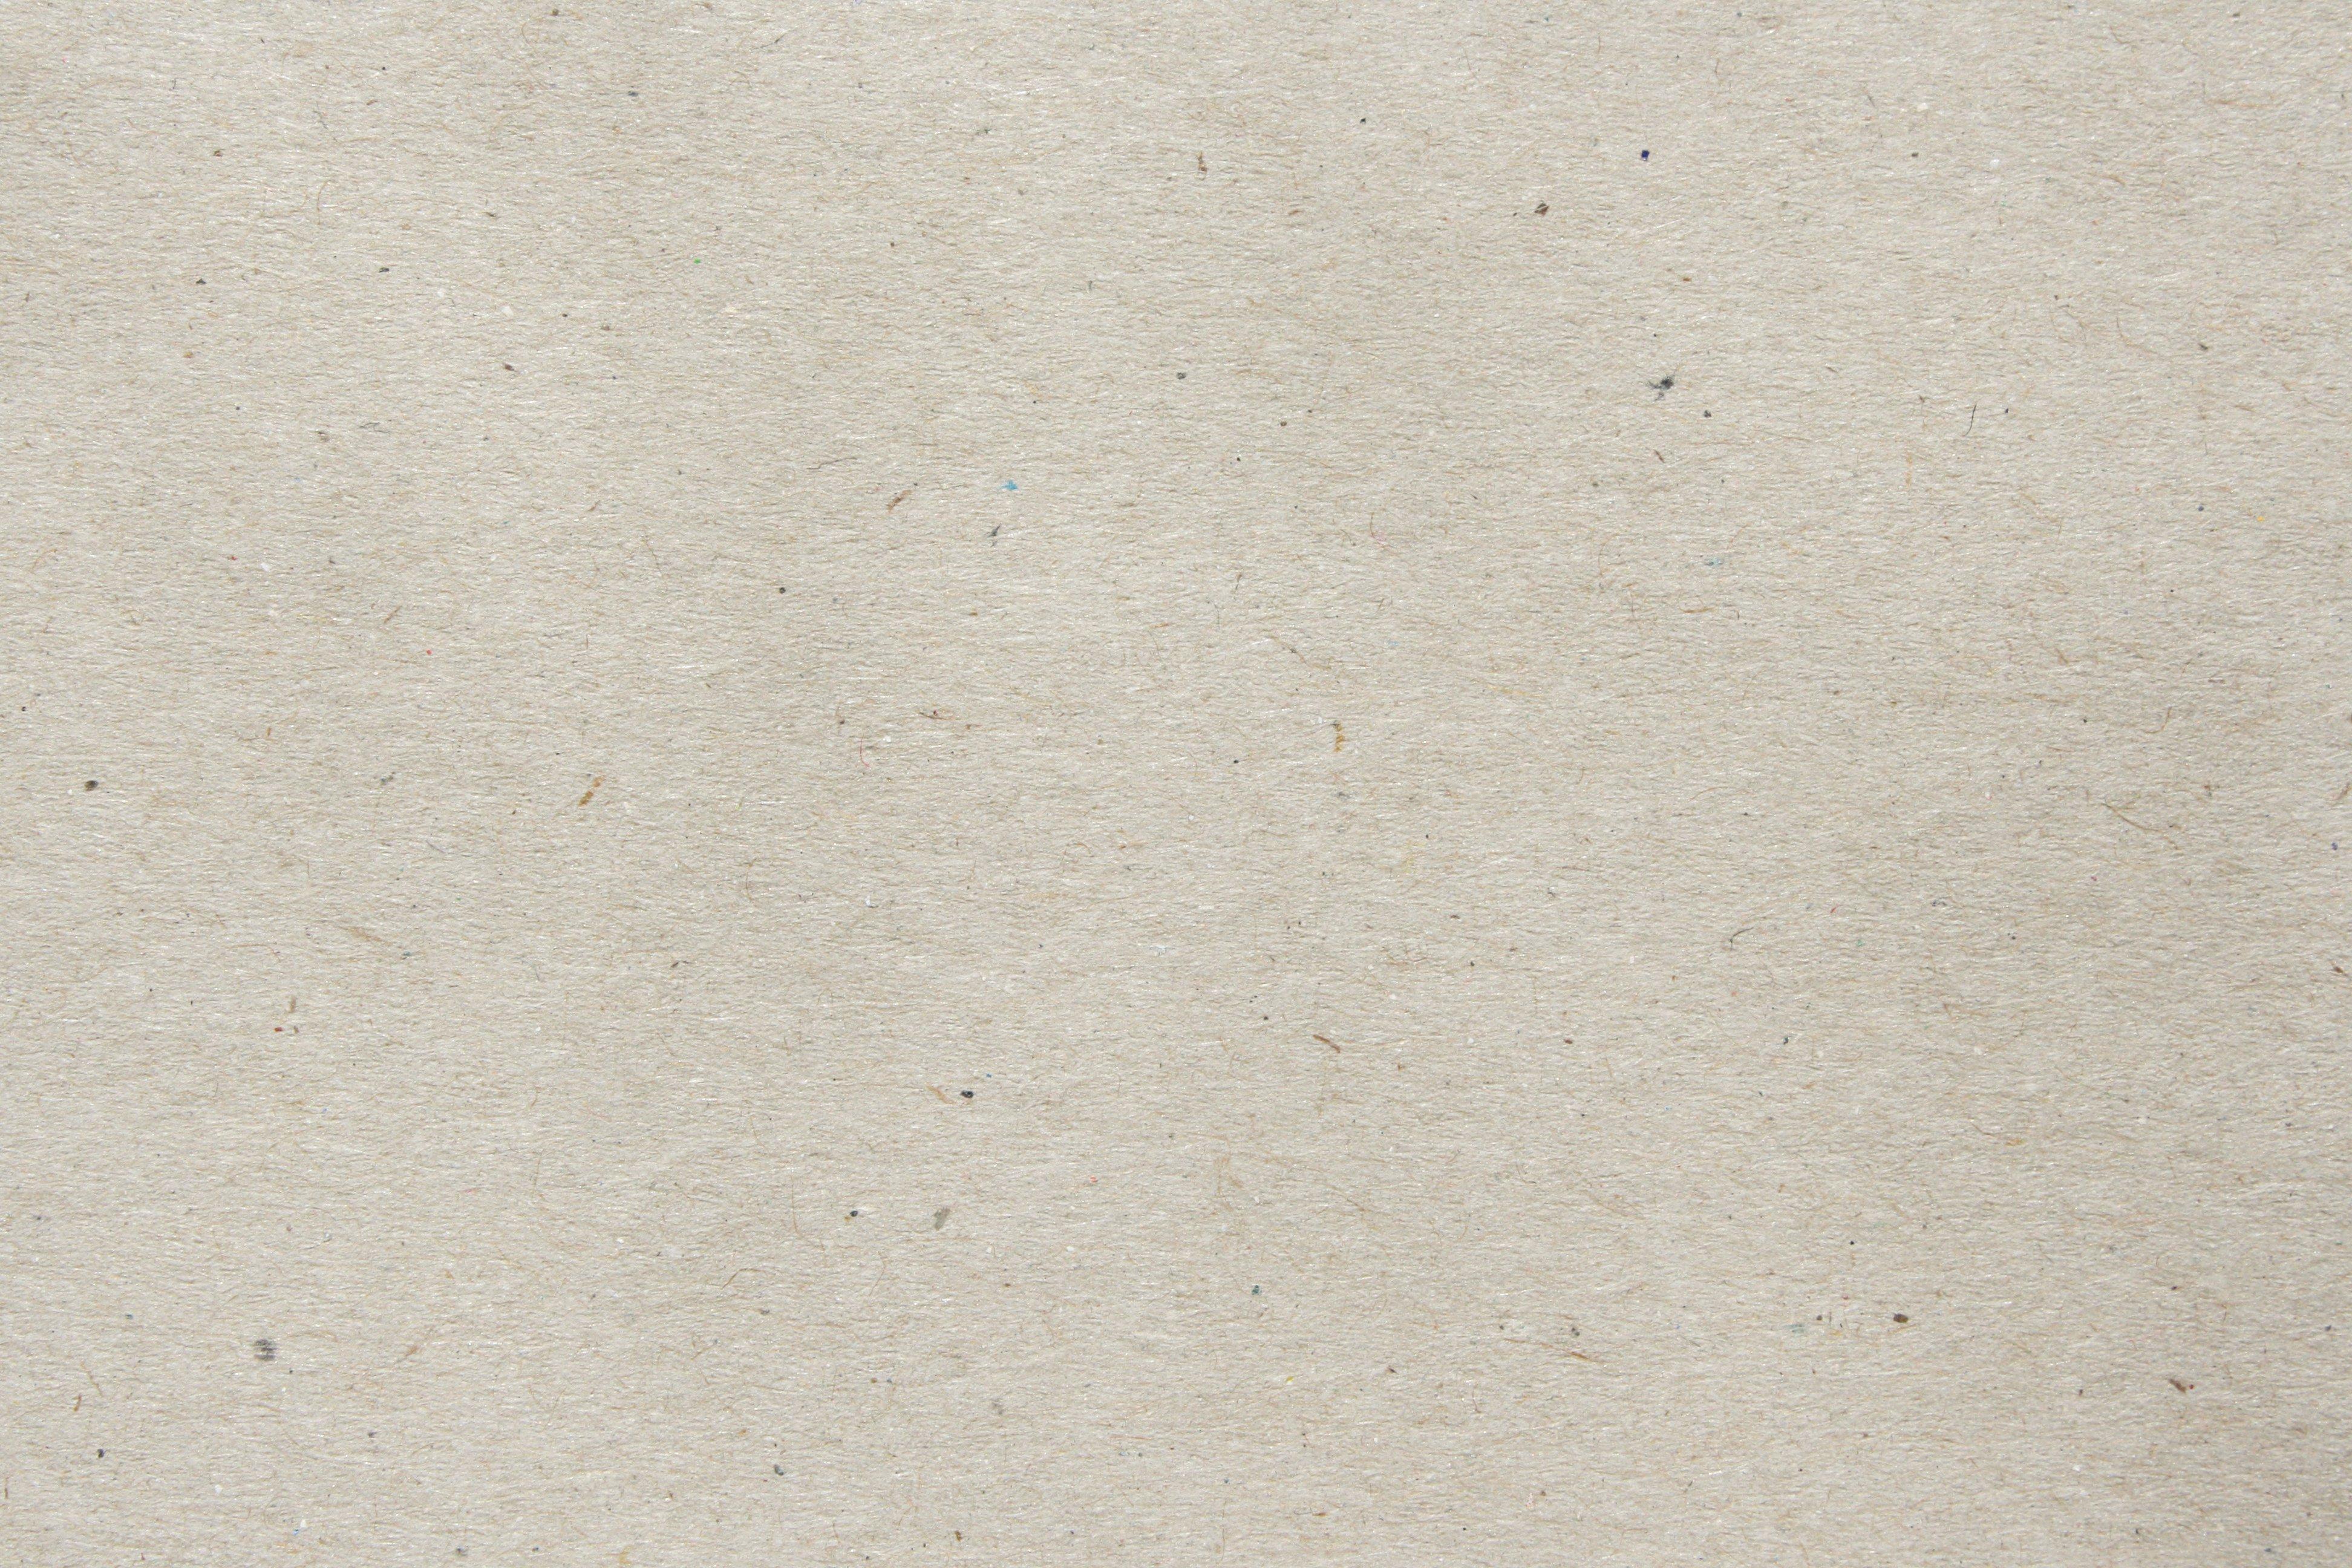 cream-colored-paper-texture-with-flecks – TheRiverChurch